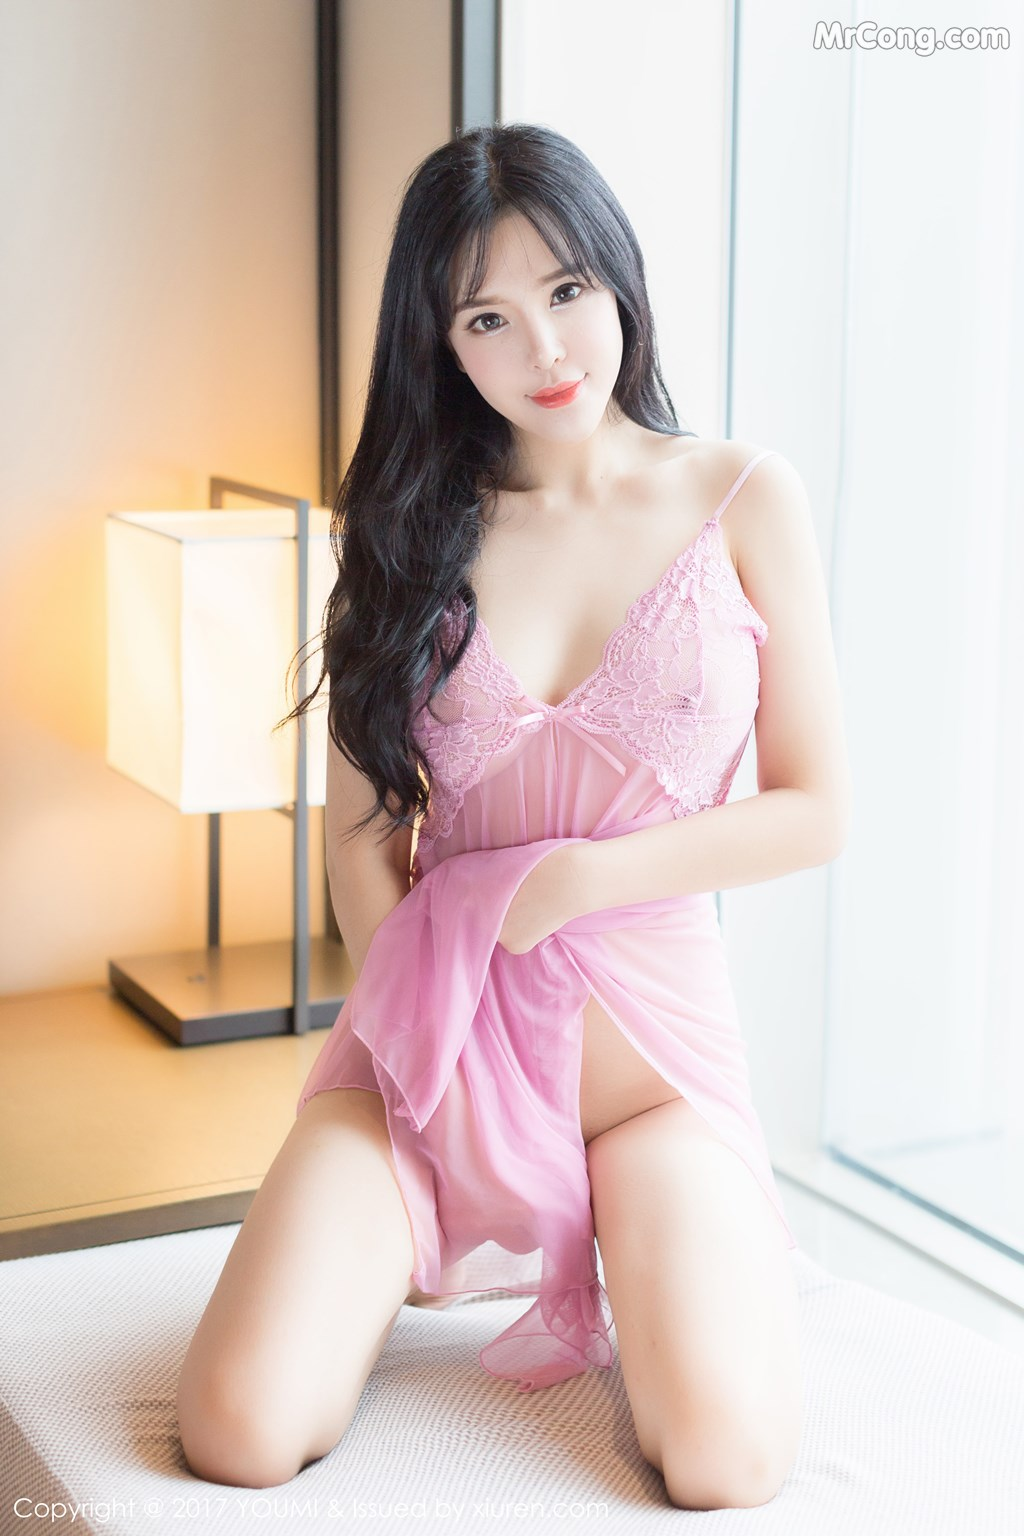 Image YouMi-No.067-Liu-Yu-Er-MrCong.com-022 in post YouMi No.067: Người mẫu Liu Yu Er (刘钰儿) (45 ảnh)